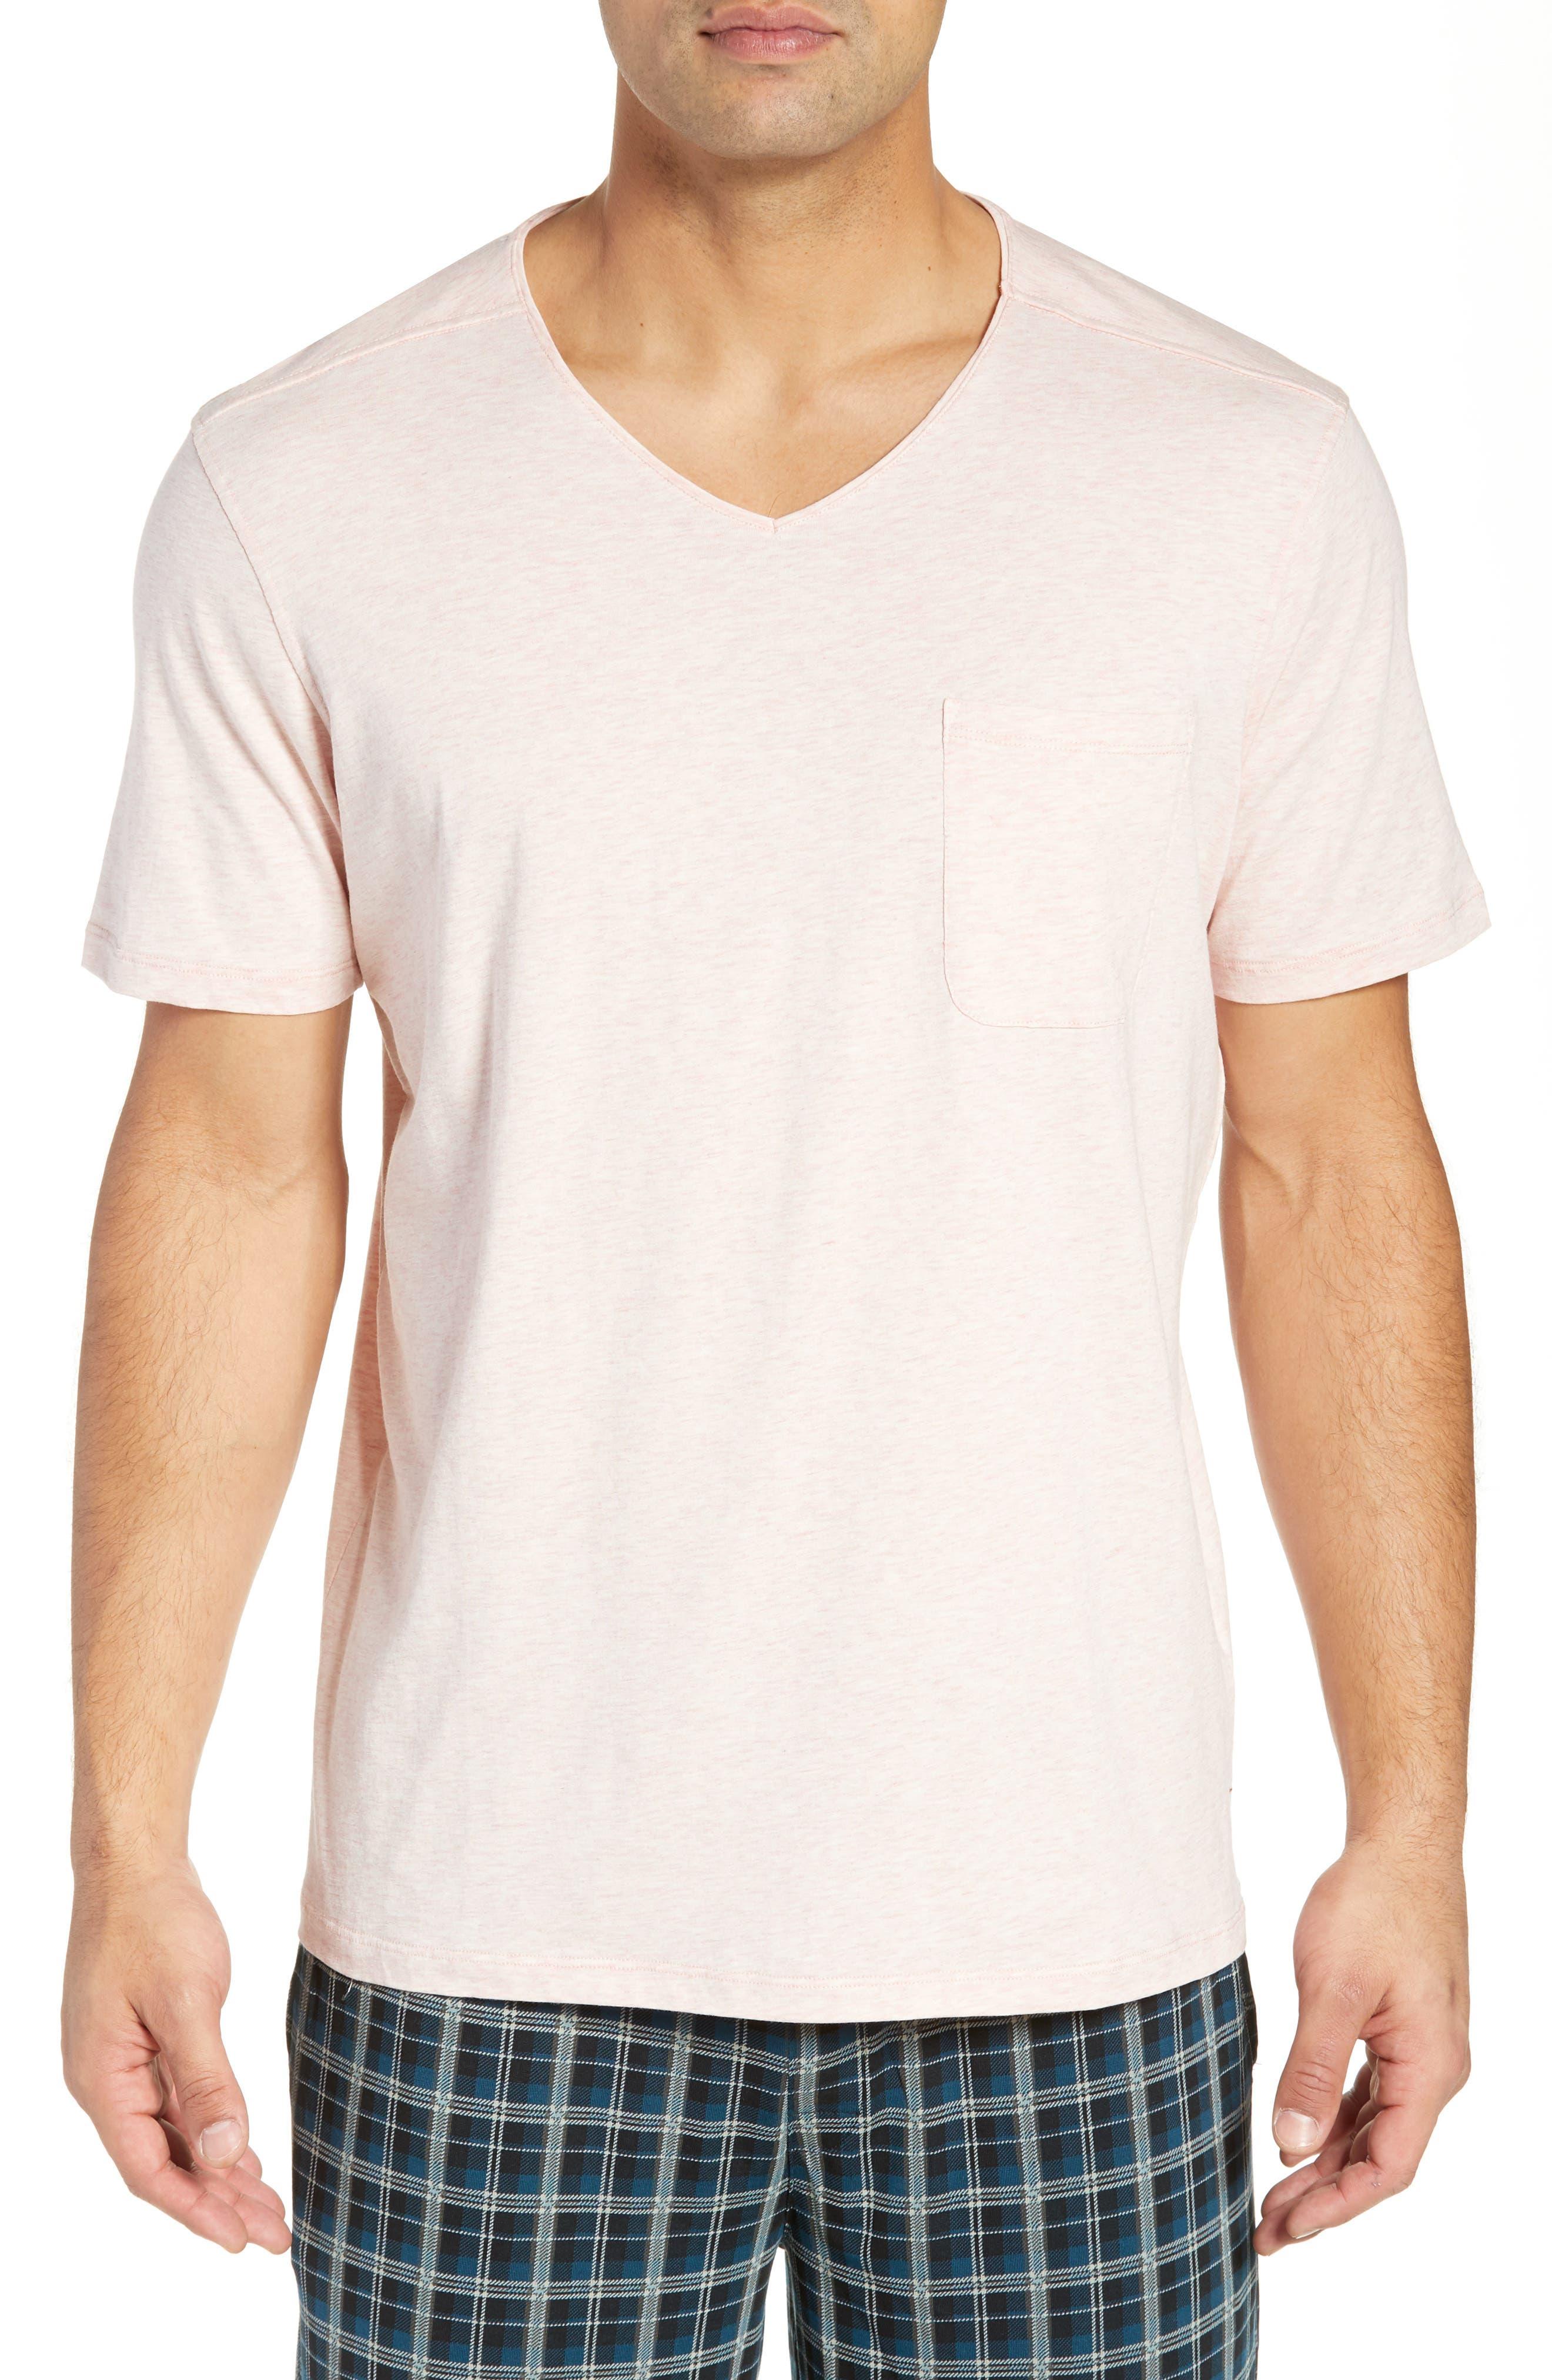 DANIEL BUCHLER V-Neck Cotton & Modal T-Shirt in Poppy